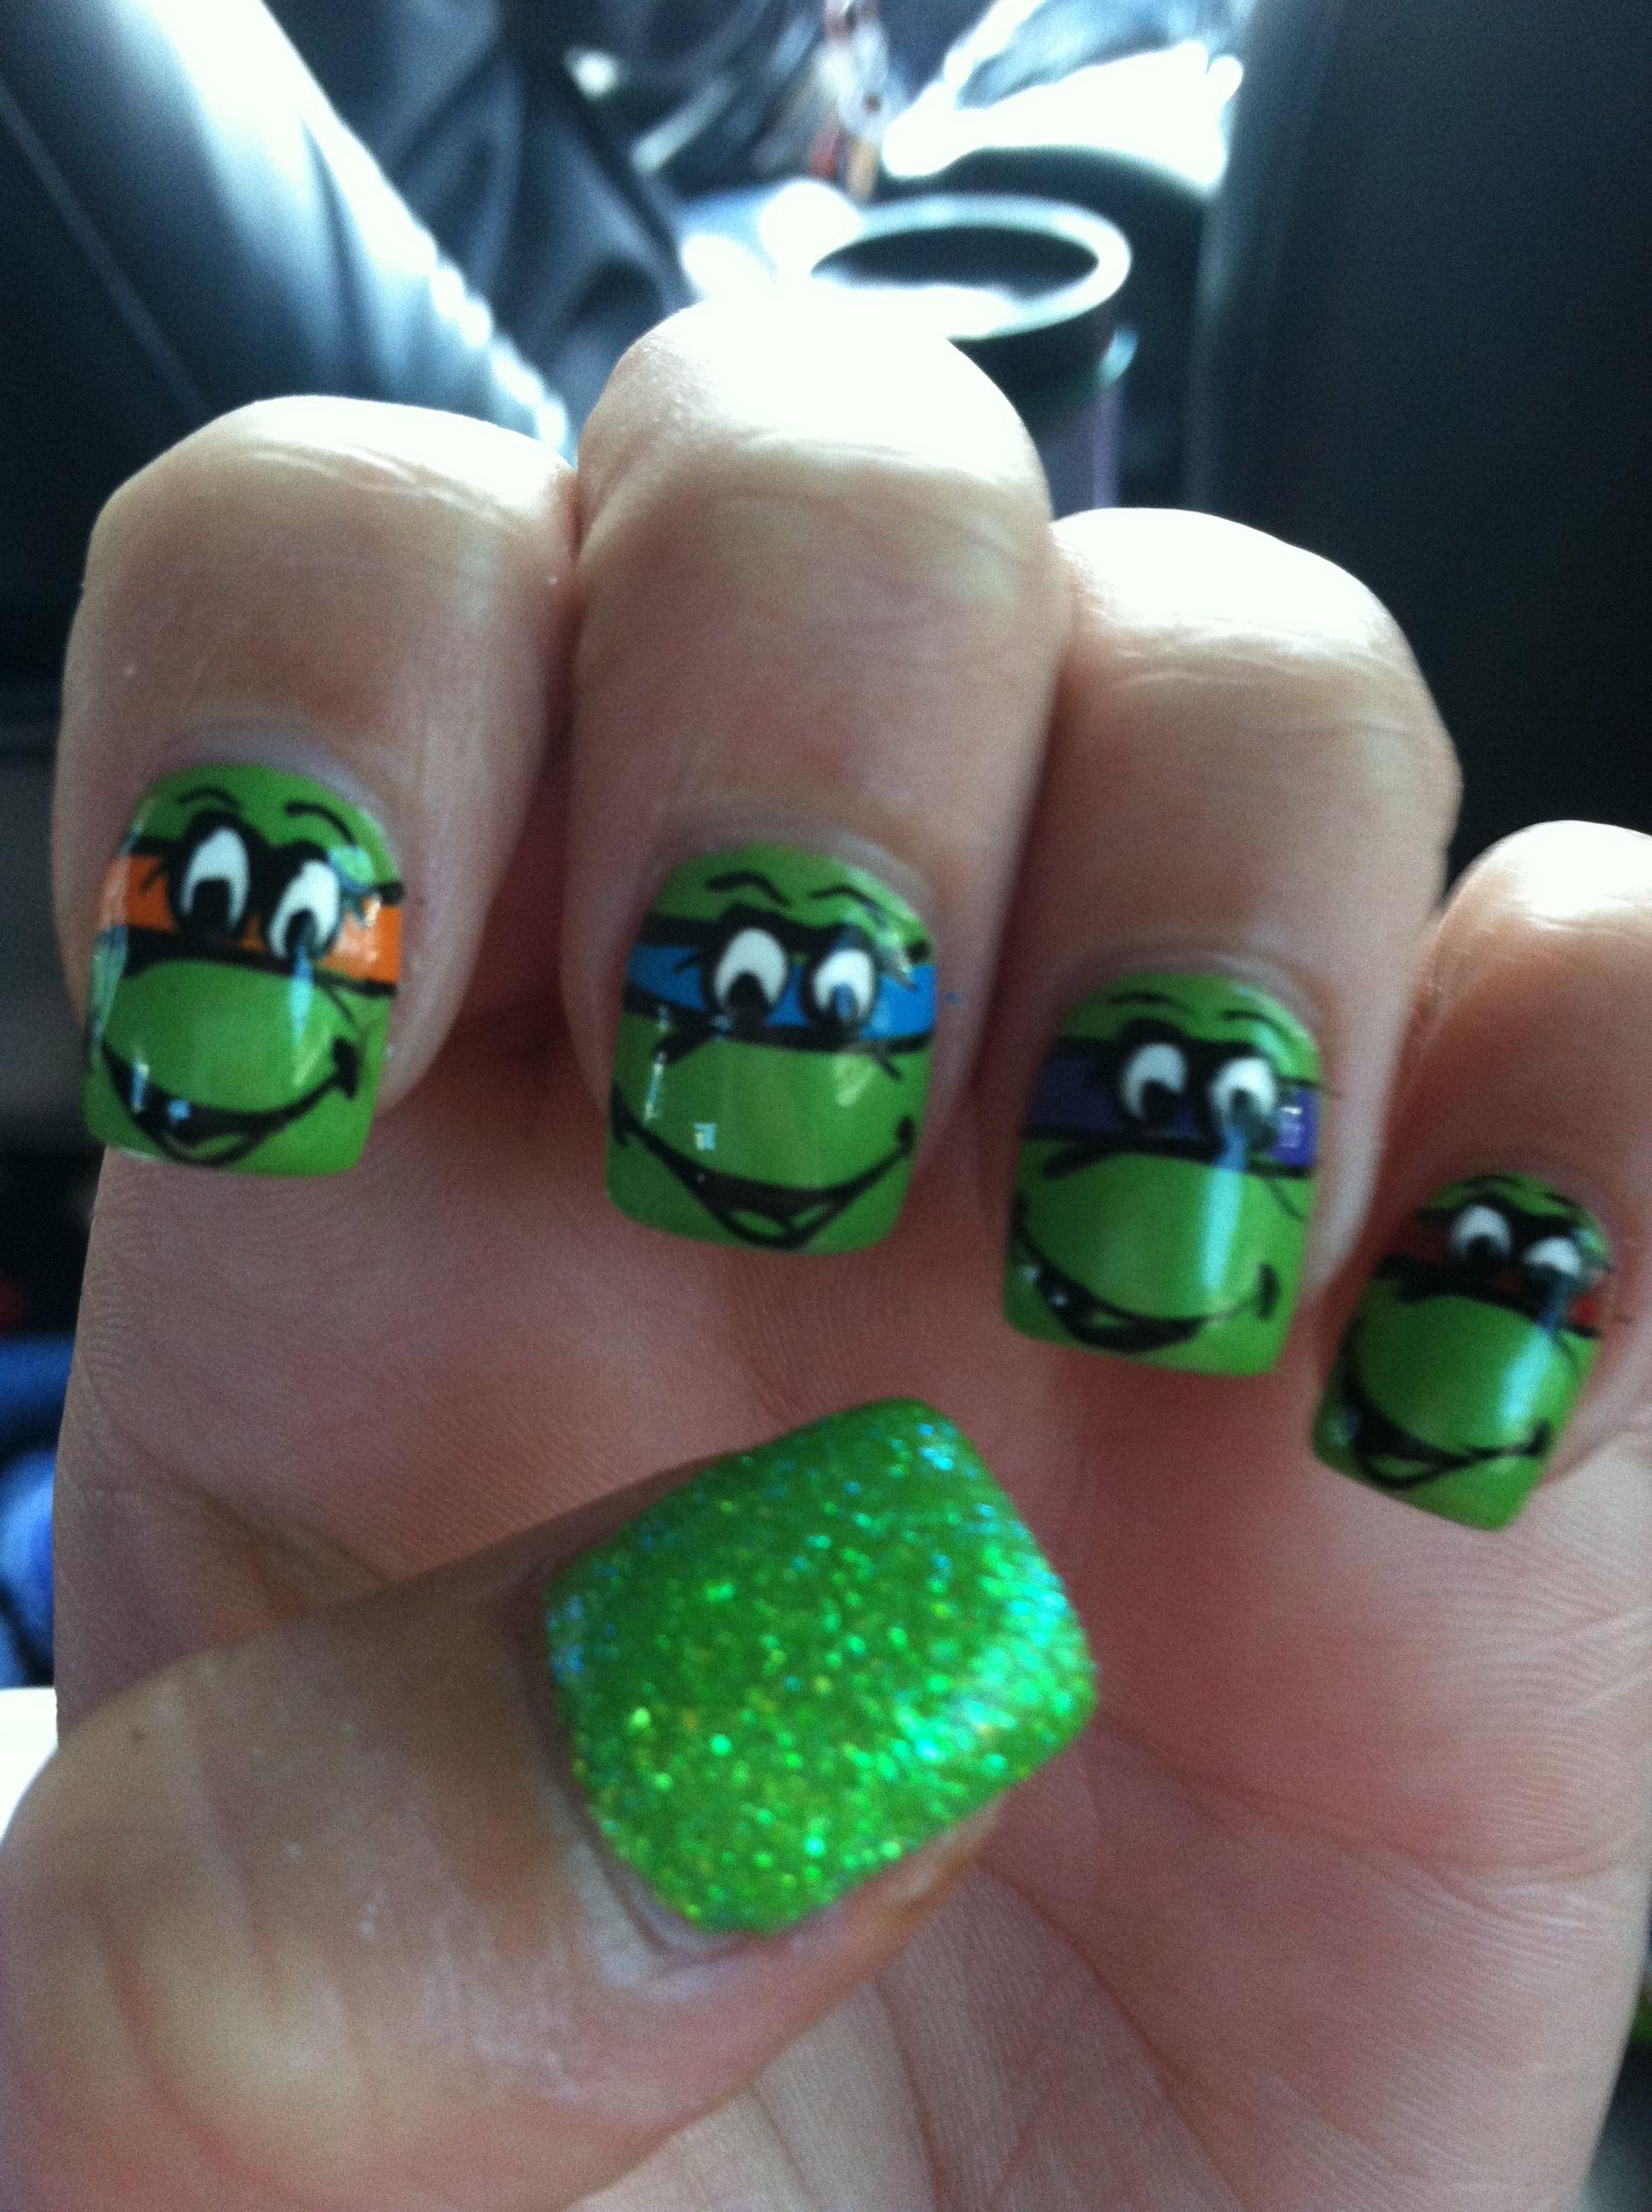 Had to get my ninja turtle nails!! | Nails | Pinterest | Ninja ...